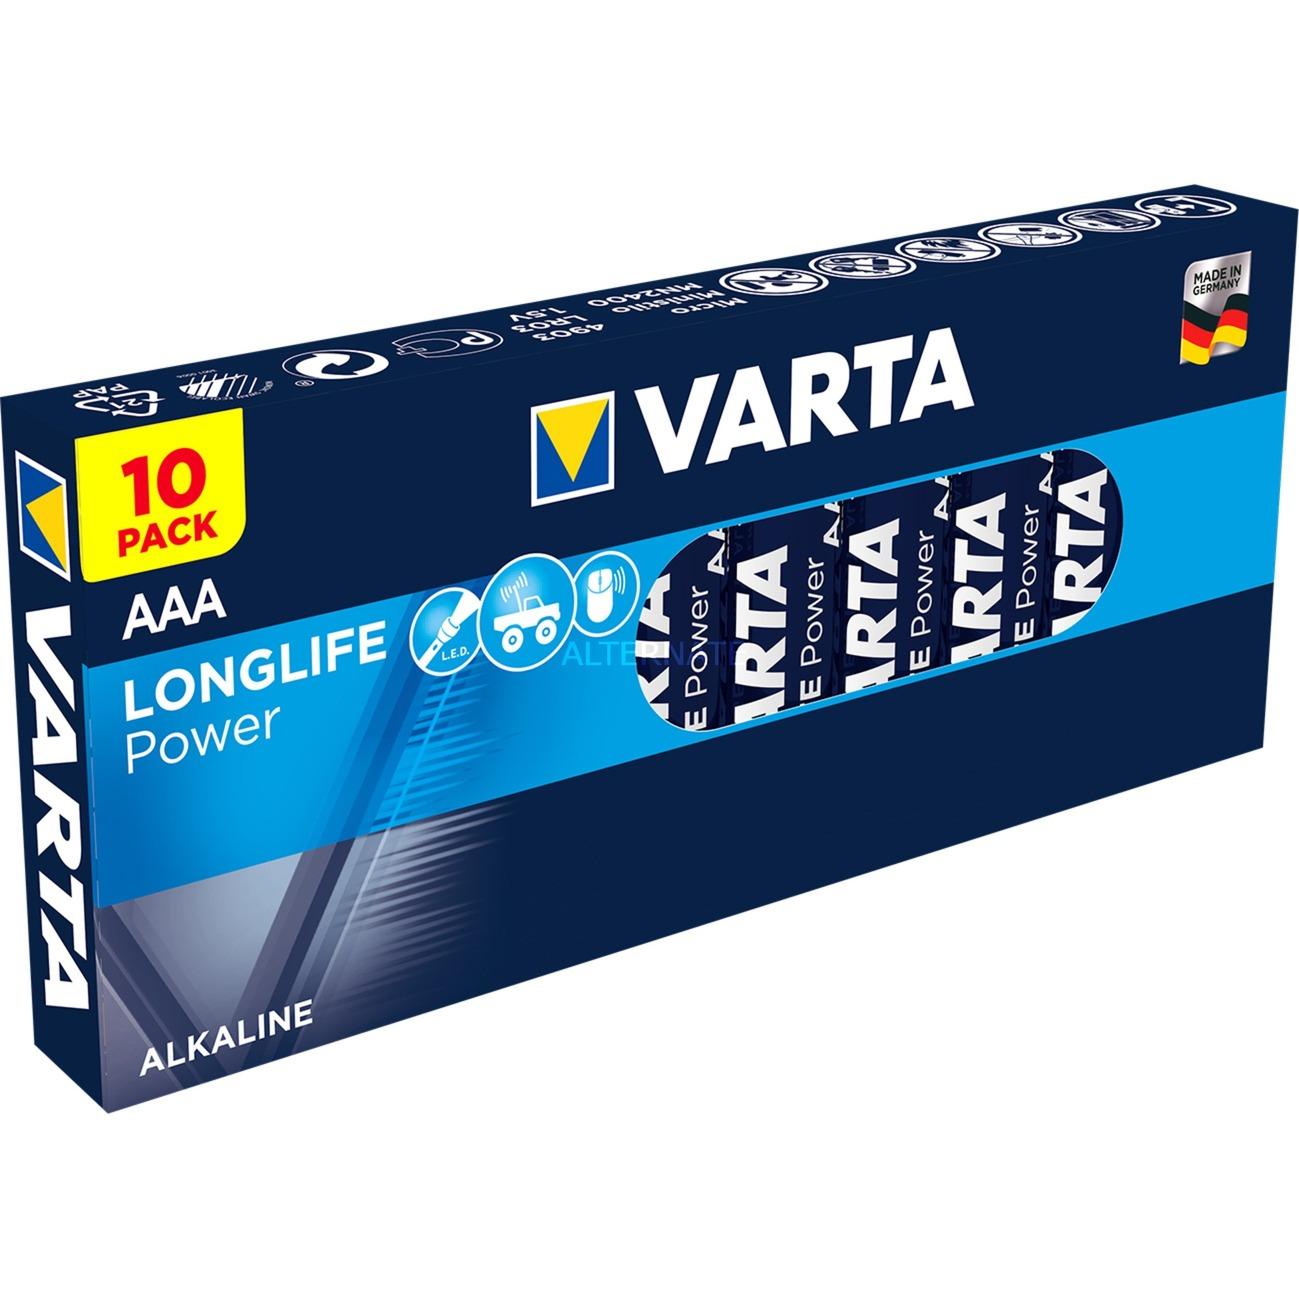 Alkaline, 1.5 V, AAA Alcaline 1.5V pile non-rechargeable, Batterie